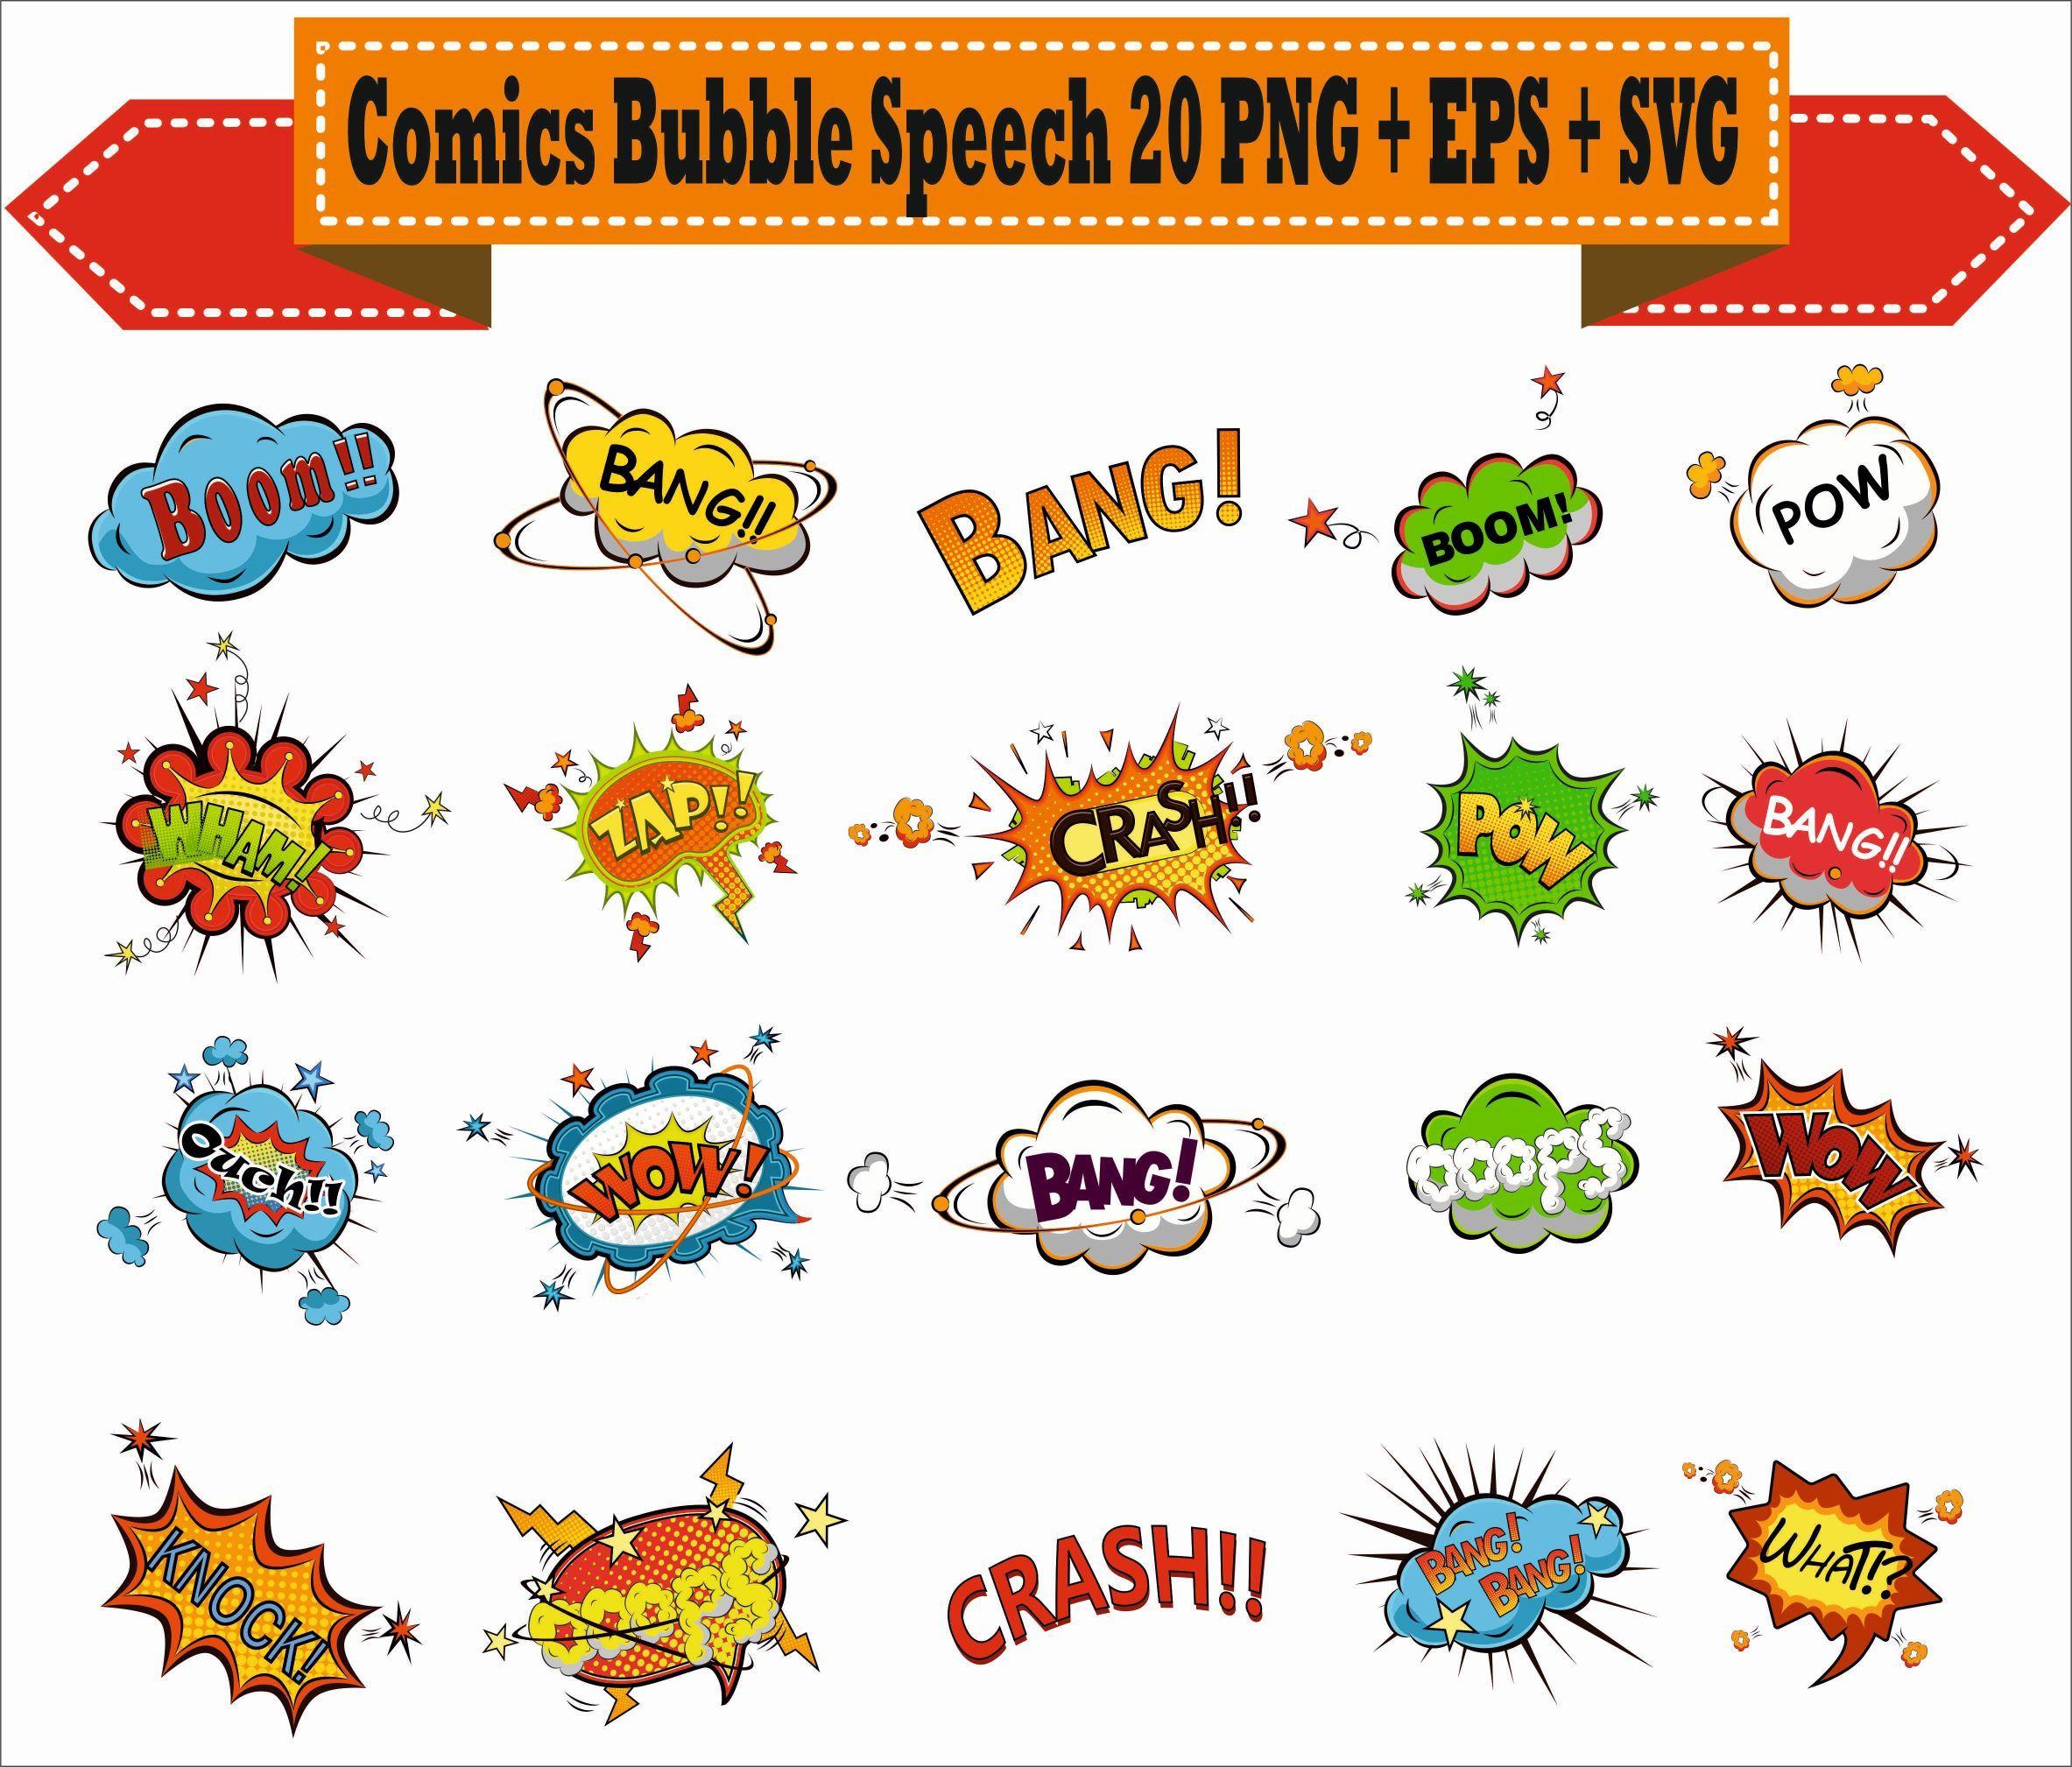 How to scrapbook words - Comics Book Speech Bubbles Pop Word Superhero Chat Play Pack Vector Clipart Png Eps Svg Digital Files Scrapbook Supplies Instant Download